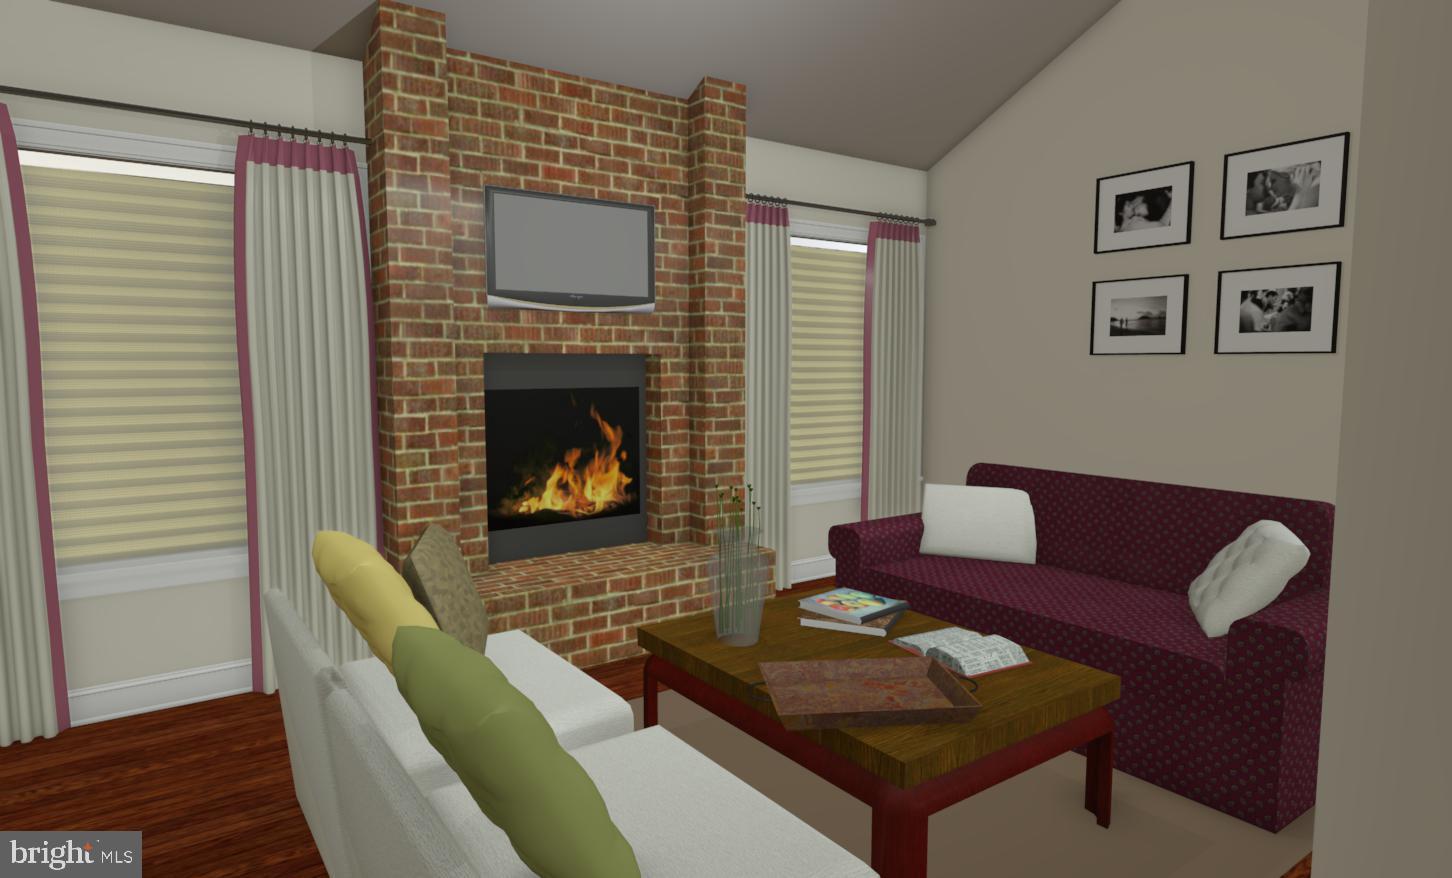 403 WILLOWBROOK DR, North Brunswick, NJ 08902 North Brunswick NJ